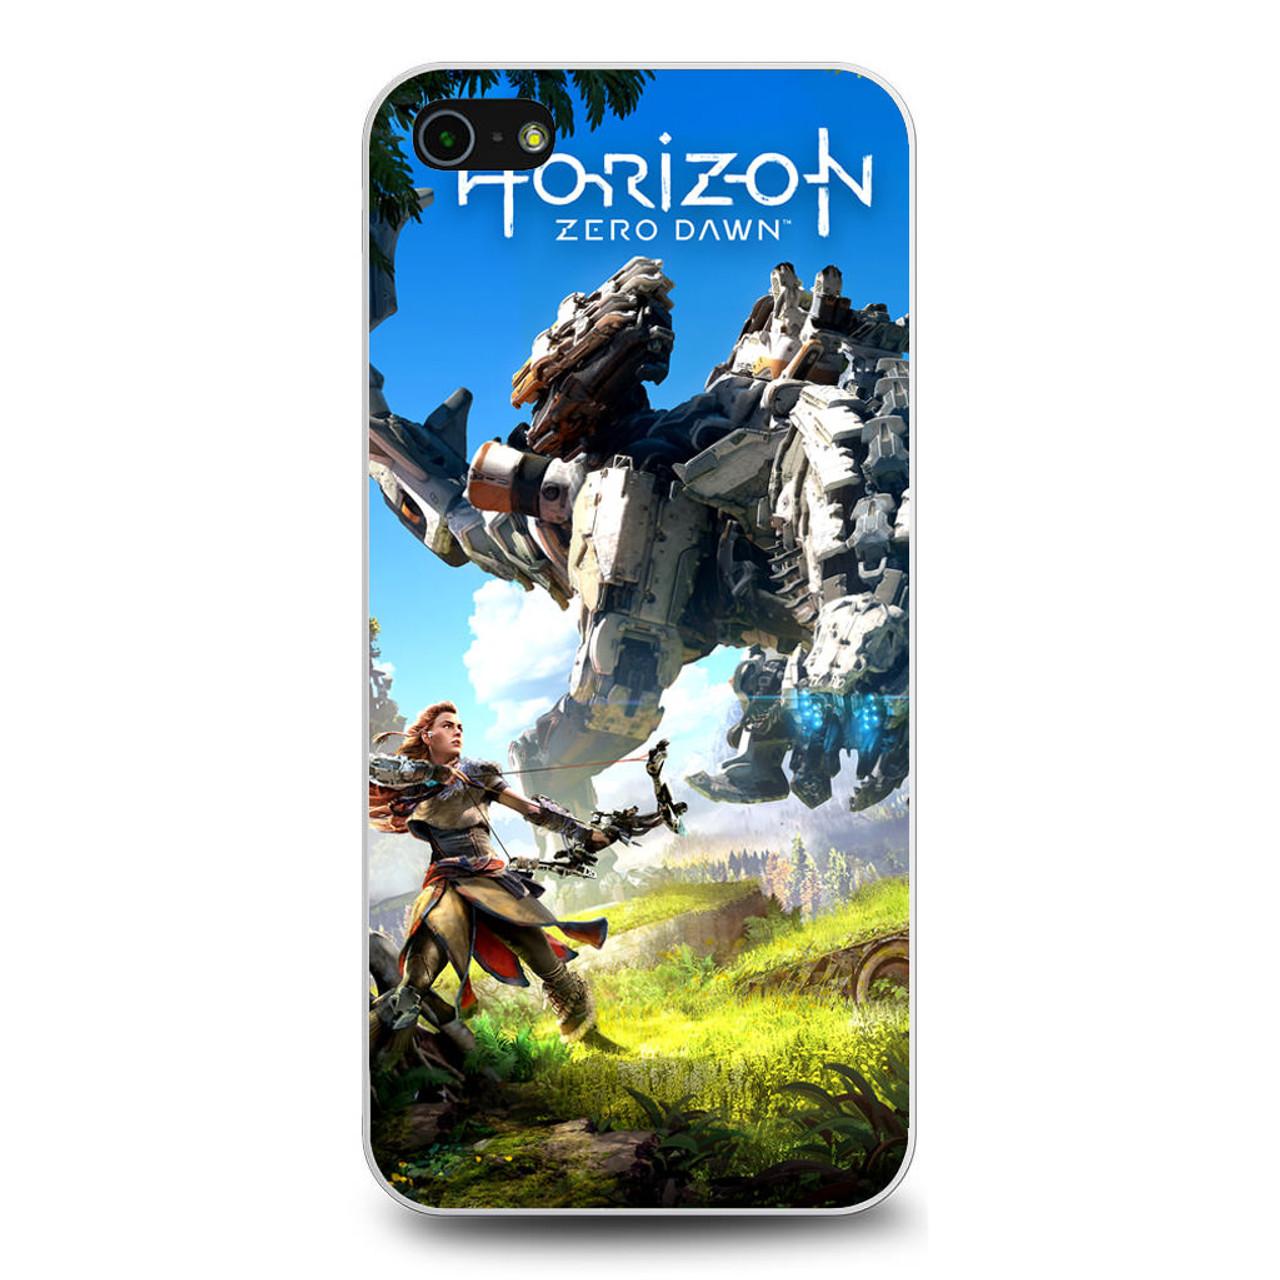 Horizon Zero Dawn Wallpaper Iphone 5 5s Se Case Caseshunter